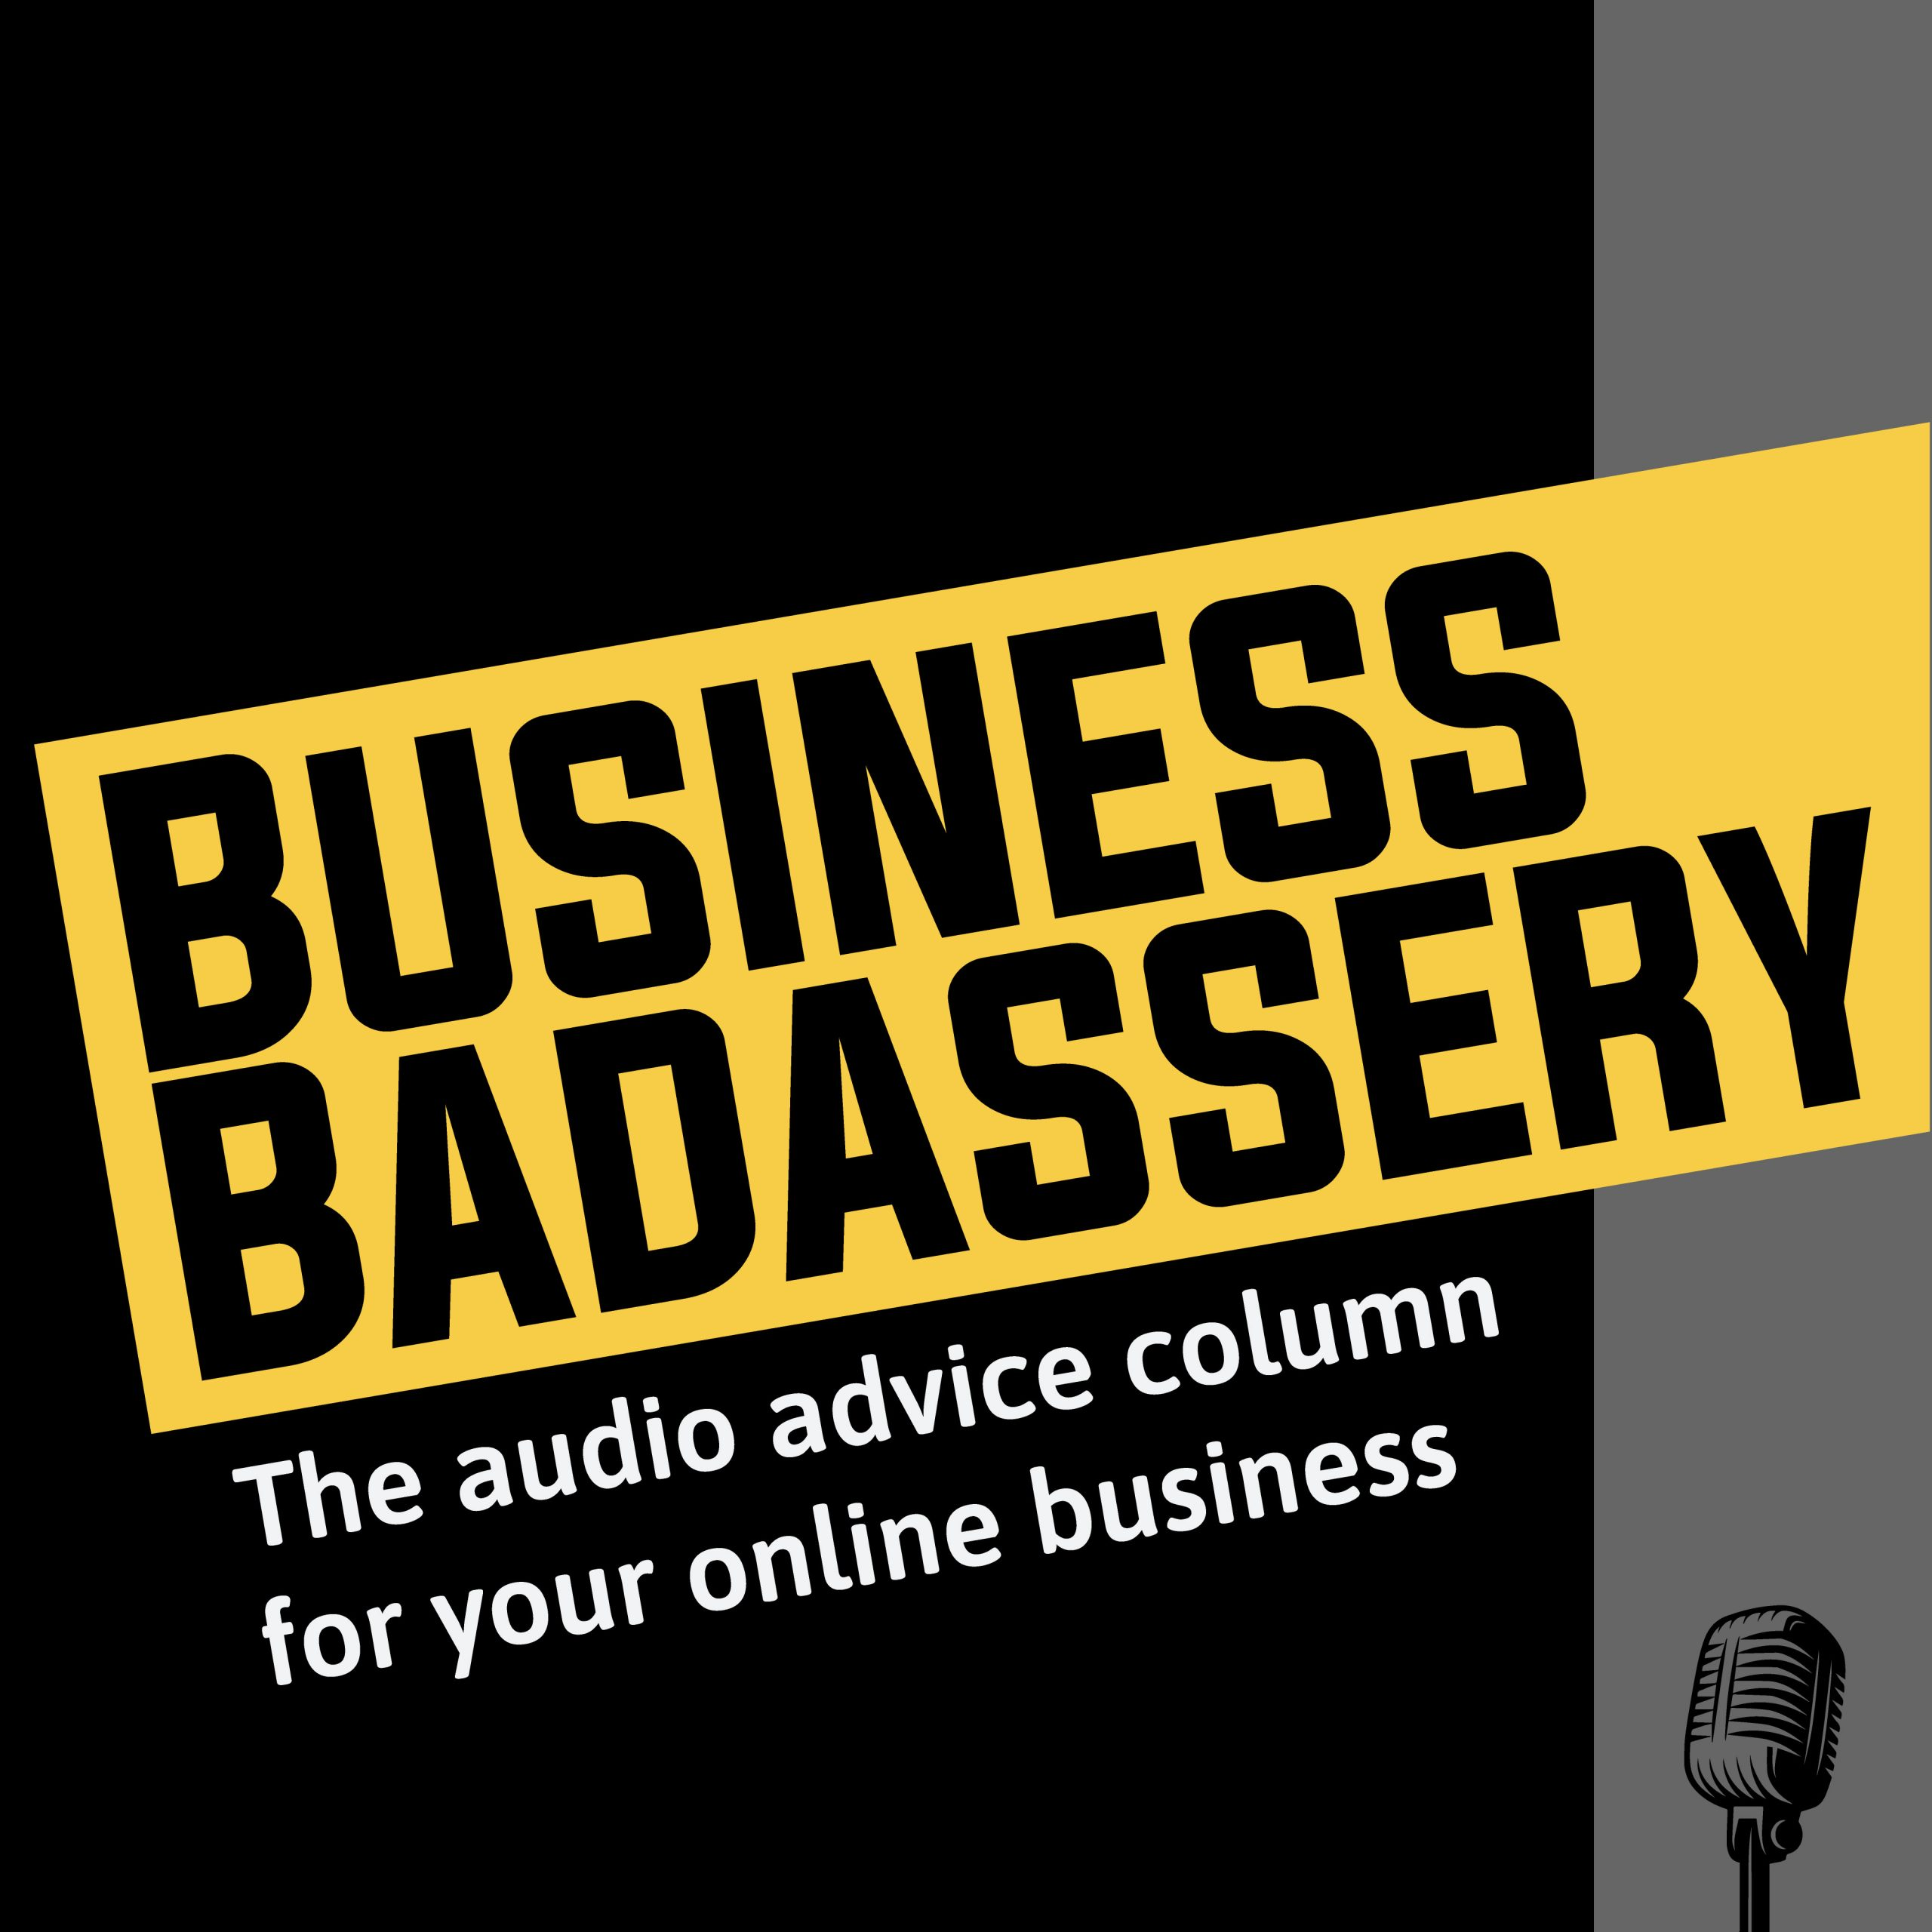 Business Badassery Podcast